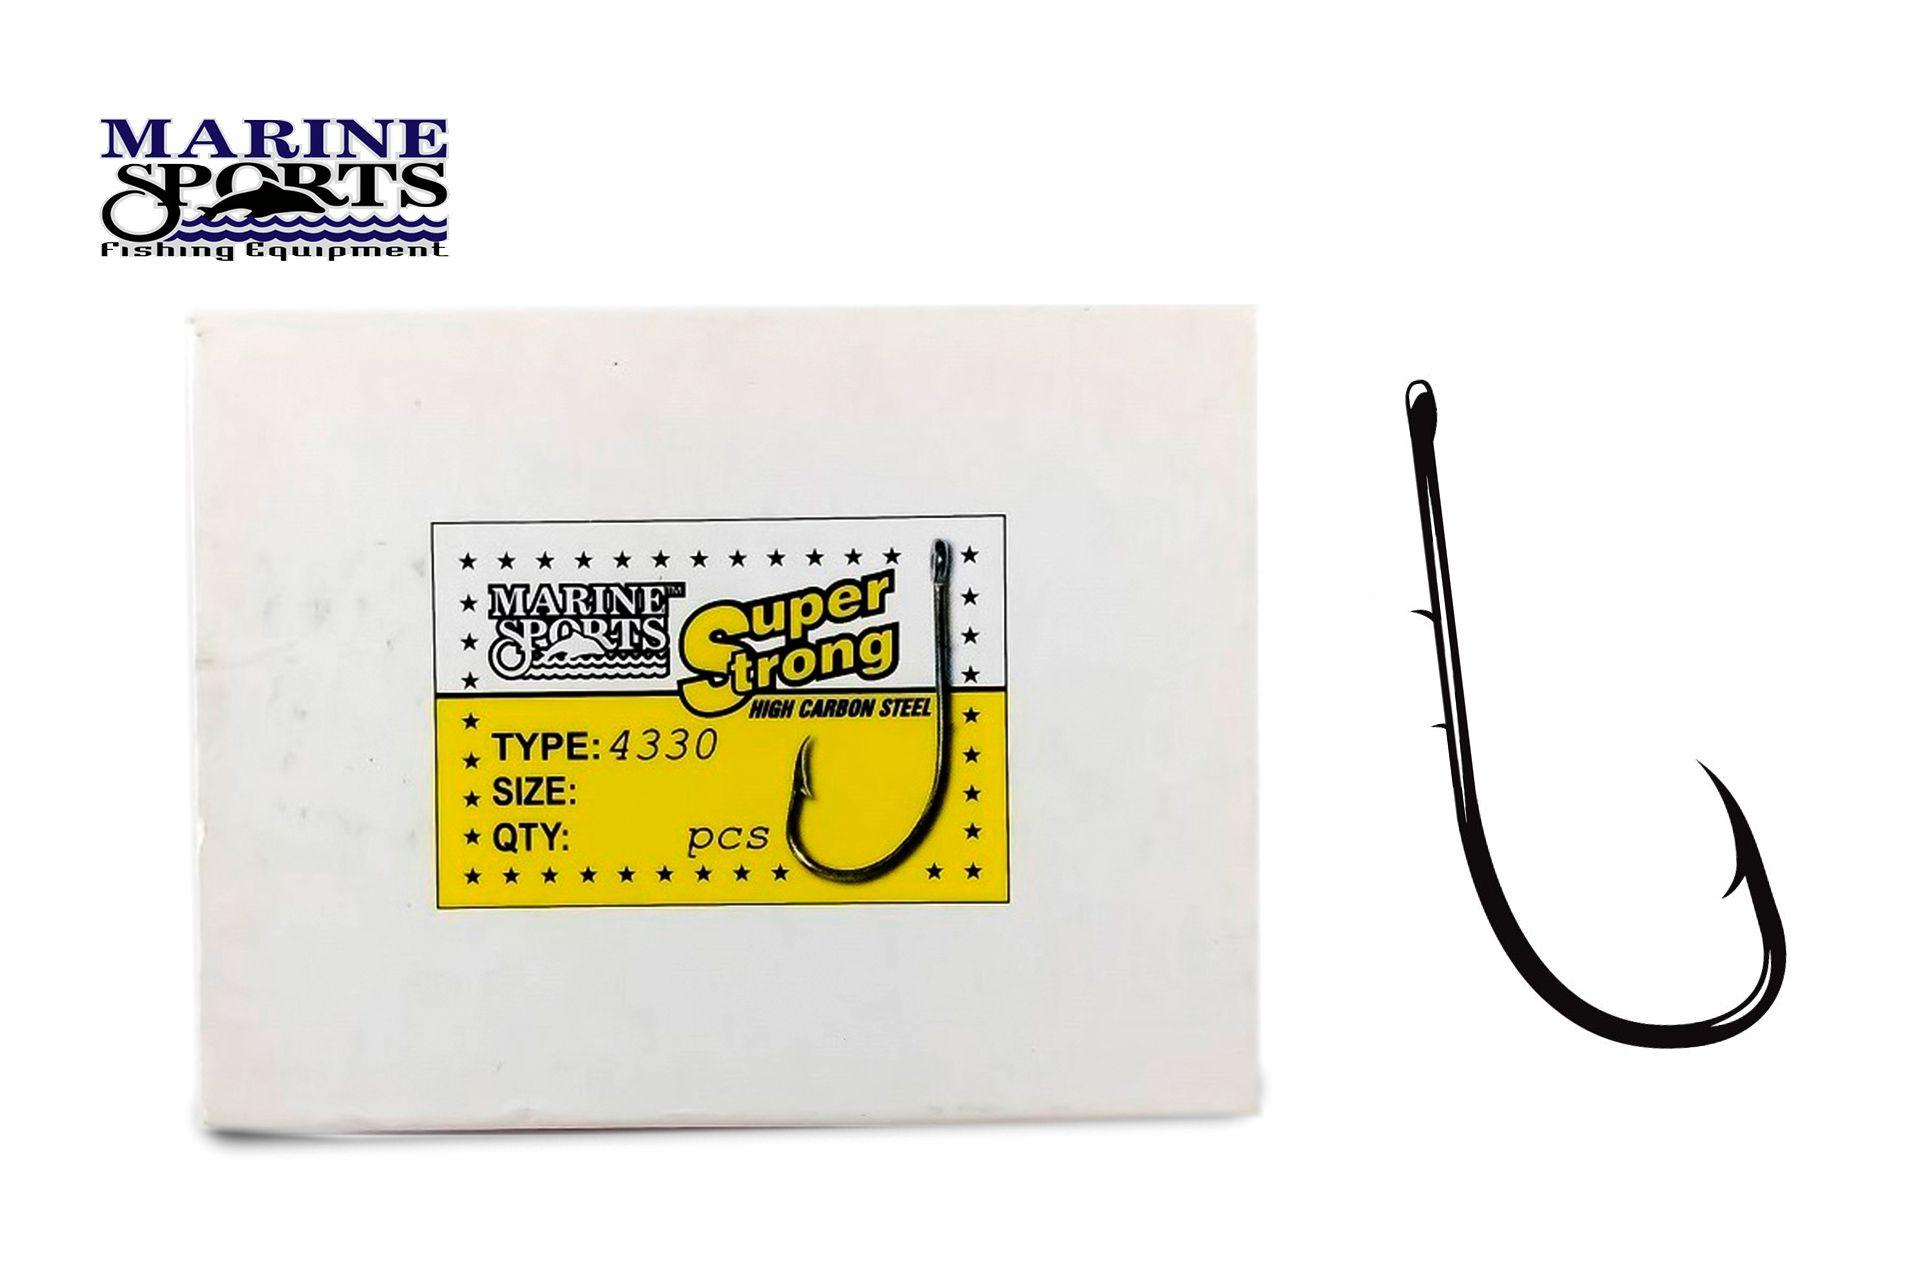 Anzol Marine Sports Super Strong 4330 N°14 (1,4cm) C/ Farpas - 100 Peças